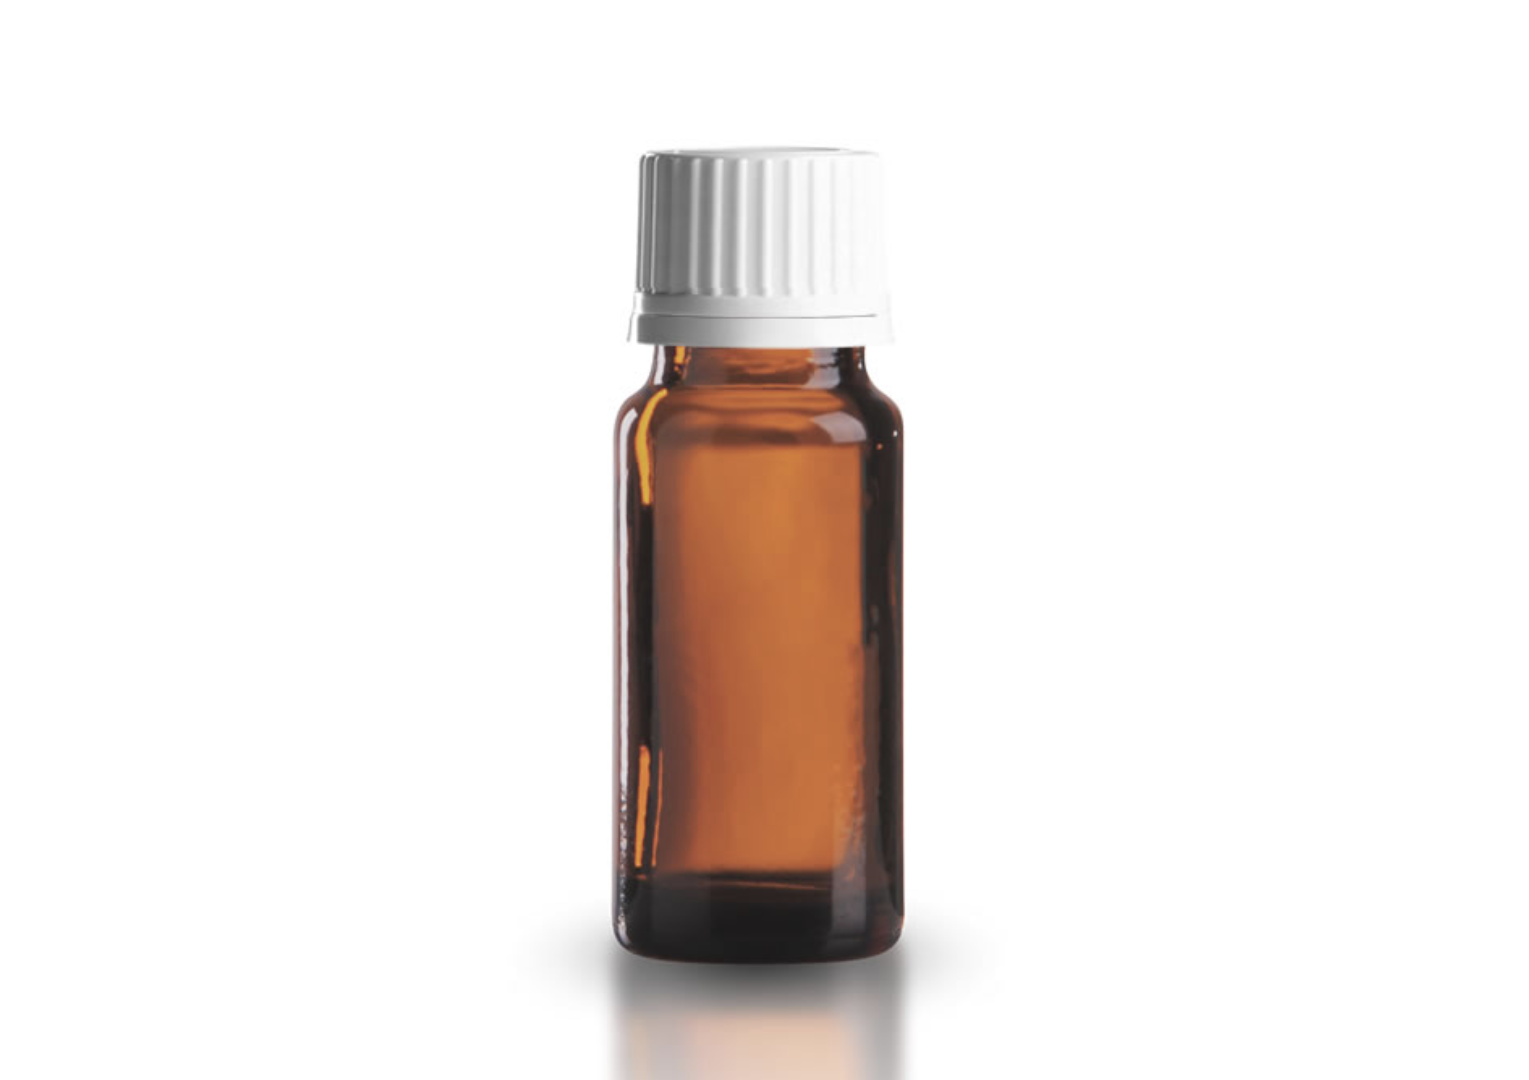 Ätherisches Öl Young Living: Leeres Öl Fläschchen 10ml